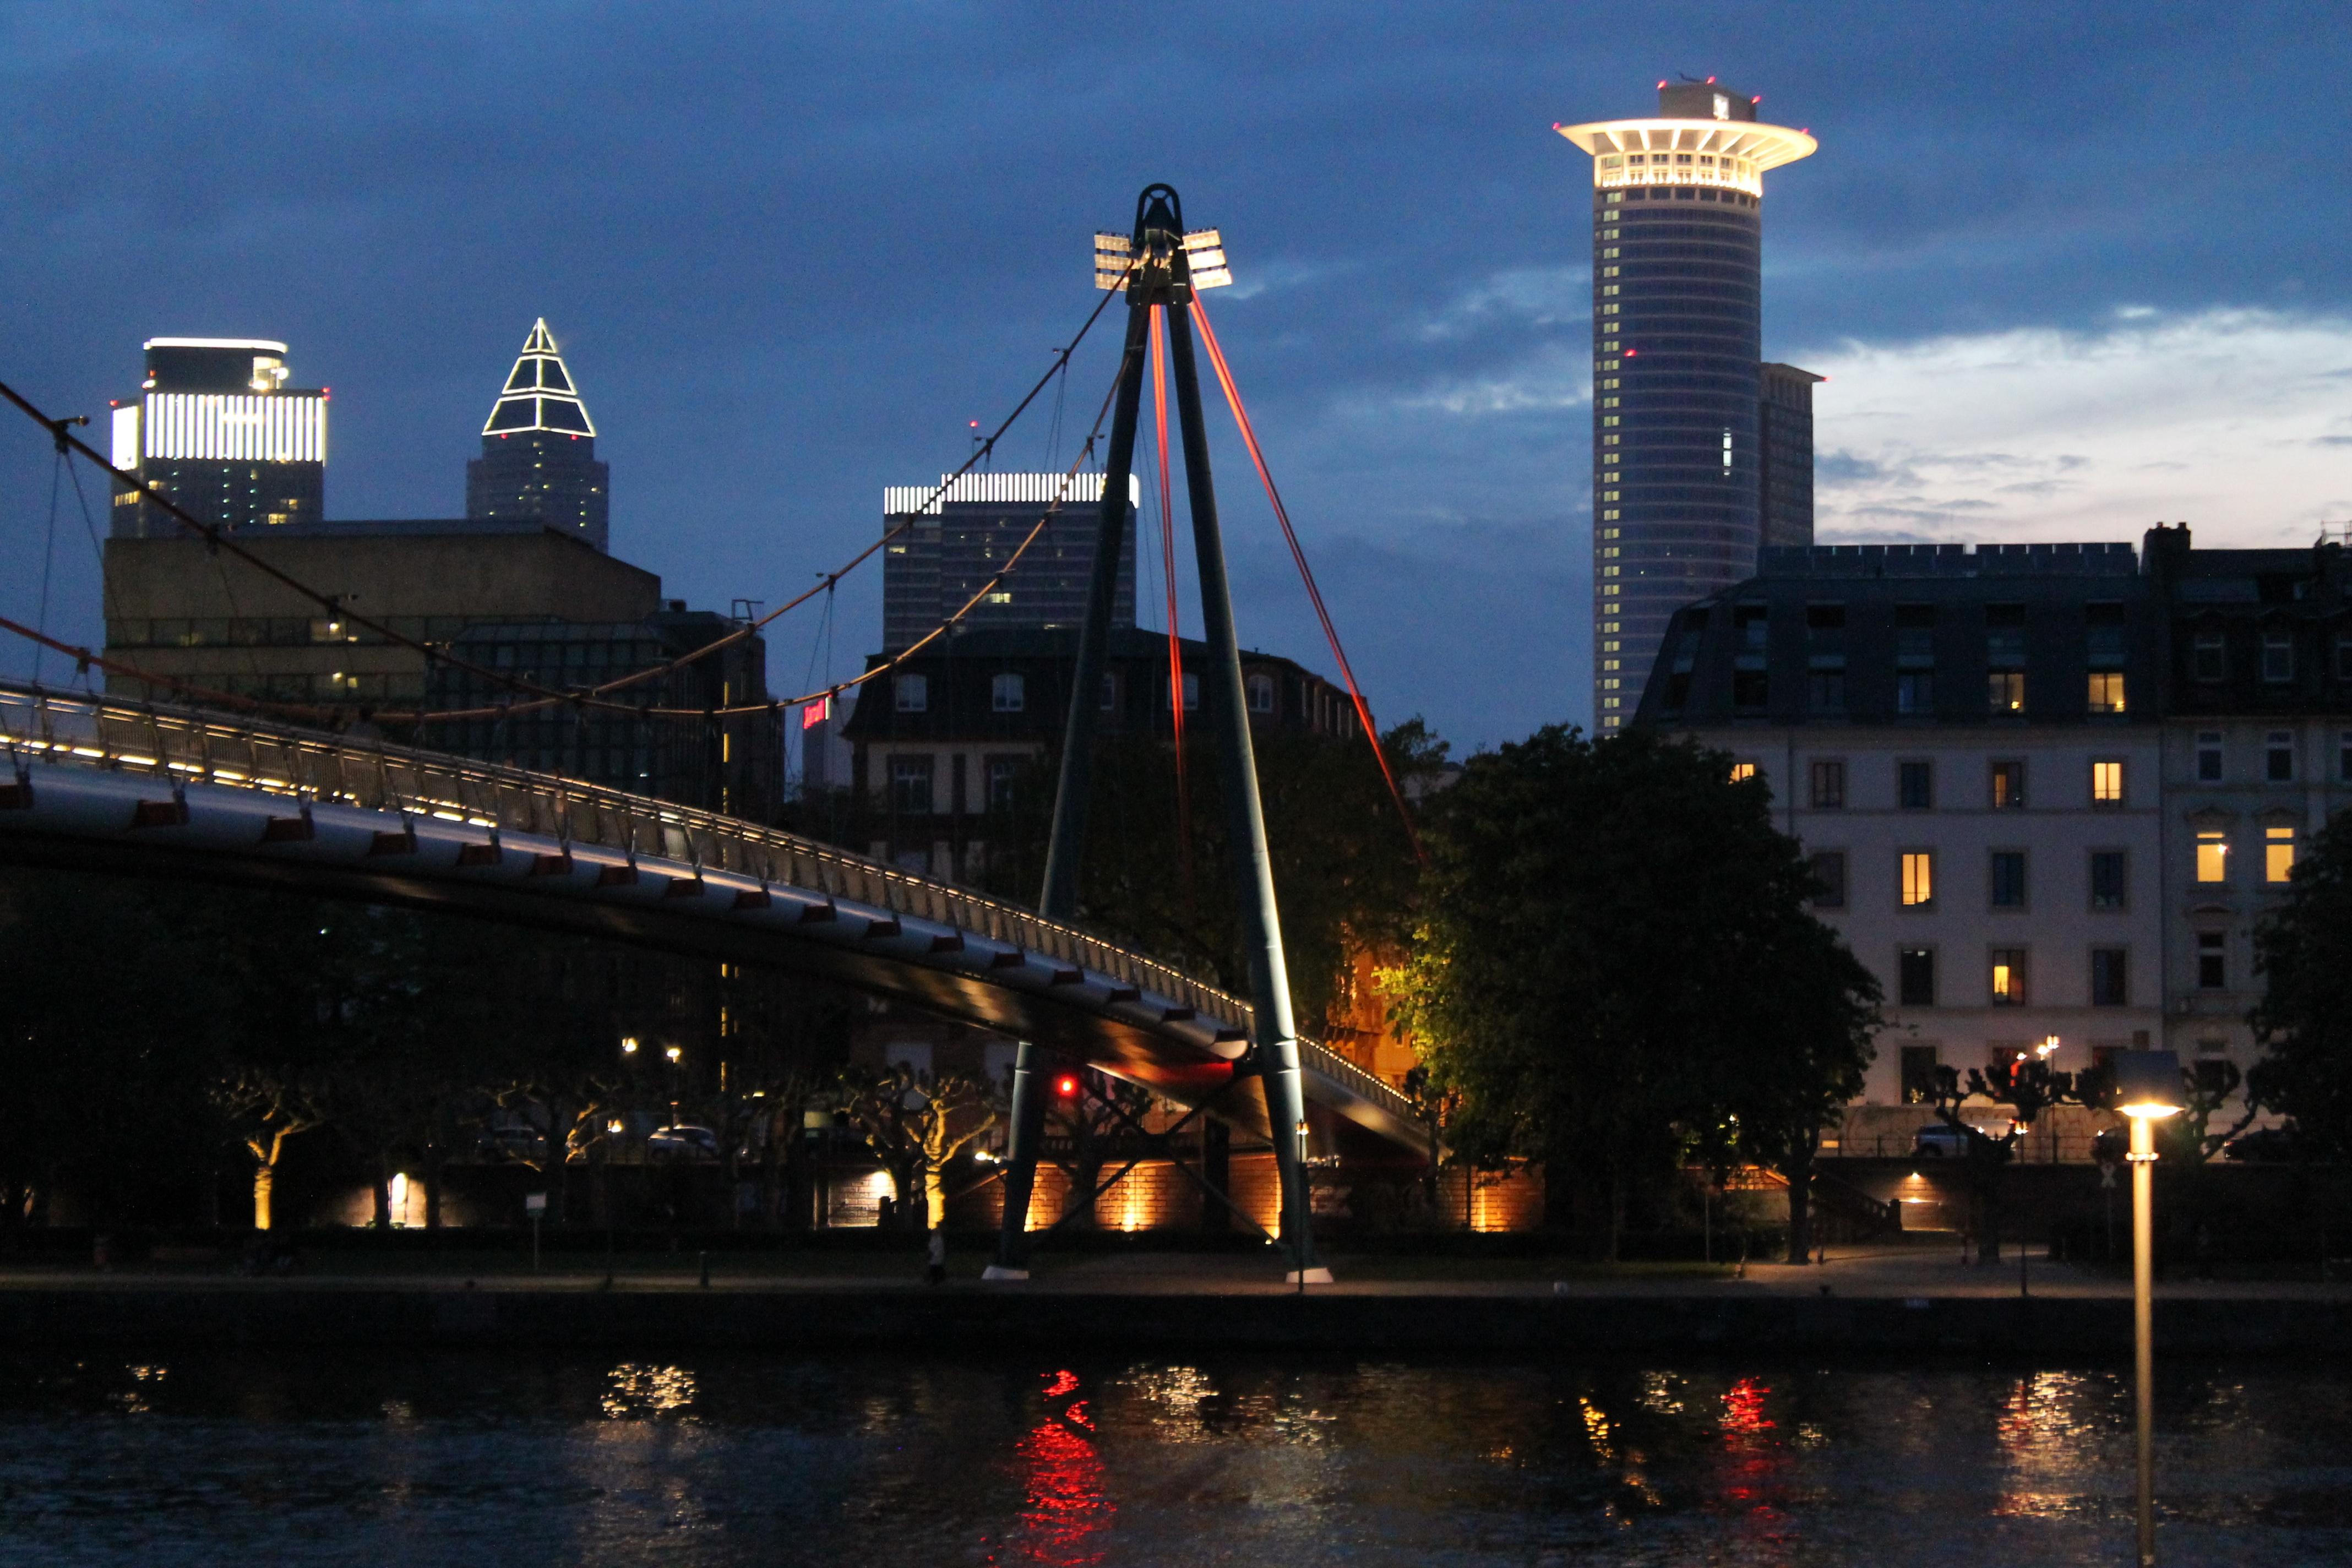 ... Downtown, Dark, Dusk, Evening, Reflection, Landmark, Harbor, Lighting,  Waterway, Lights, Reflections, Frankfurt Am Main Germany, Hesse, Town Center,  ...